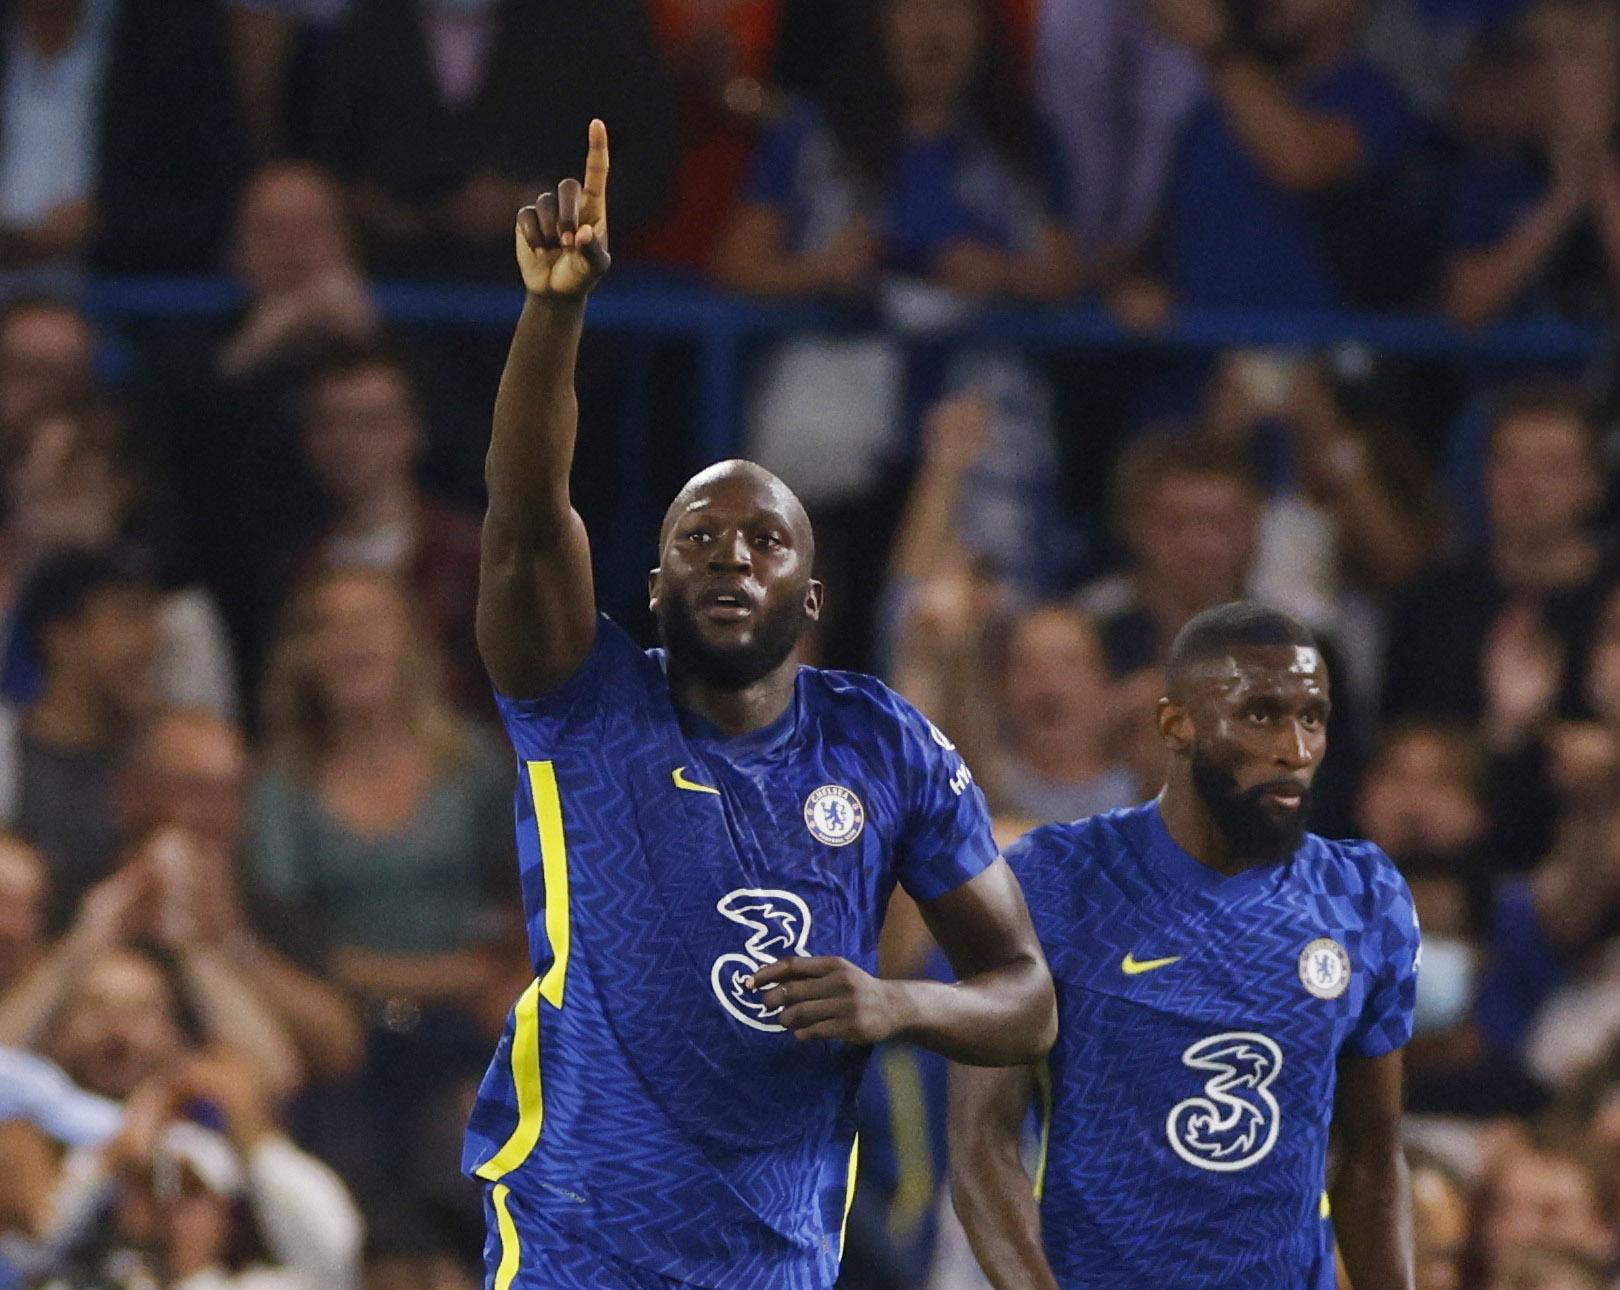 Champions League: Τα αποτελέσματα της βραδιάς – Δείτε όλα τα γκολ